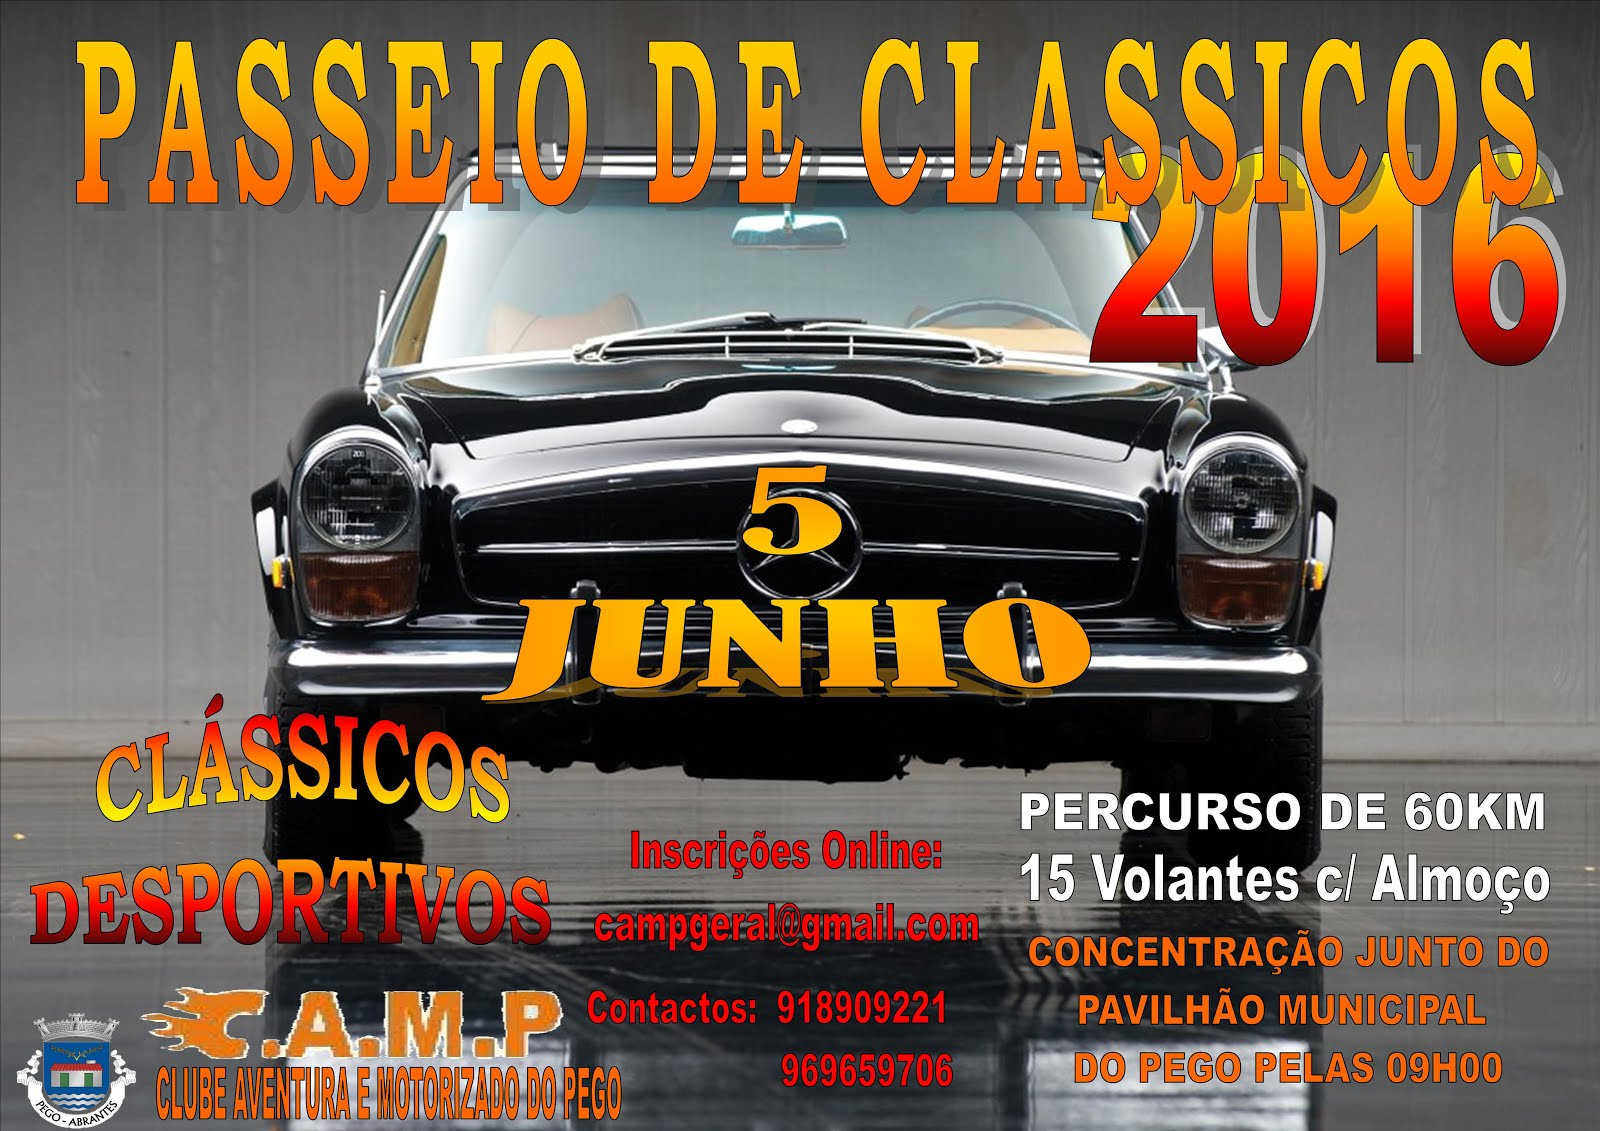 PASSEIO DE CLASSICOS 2016